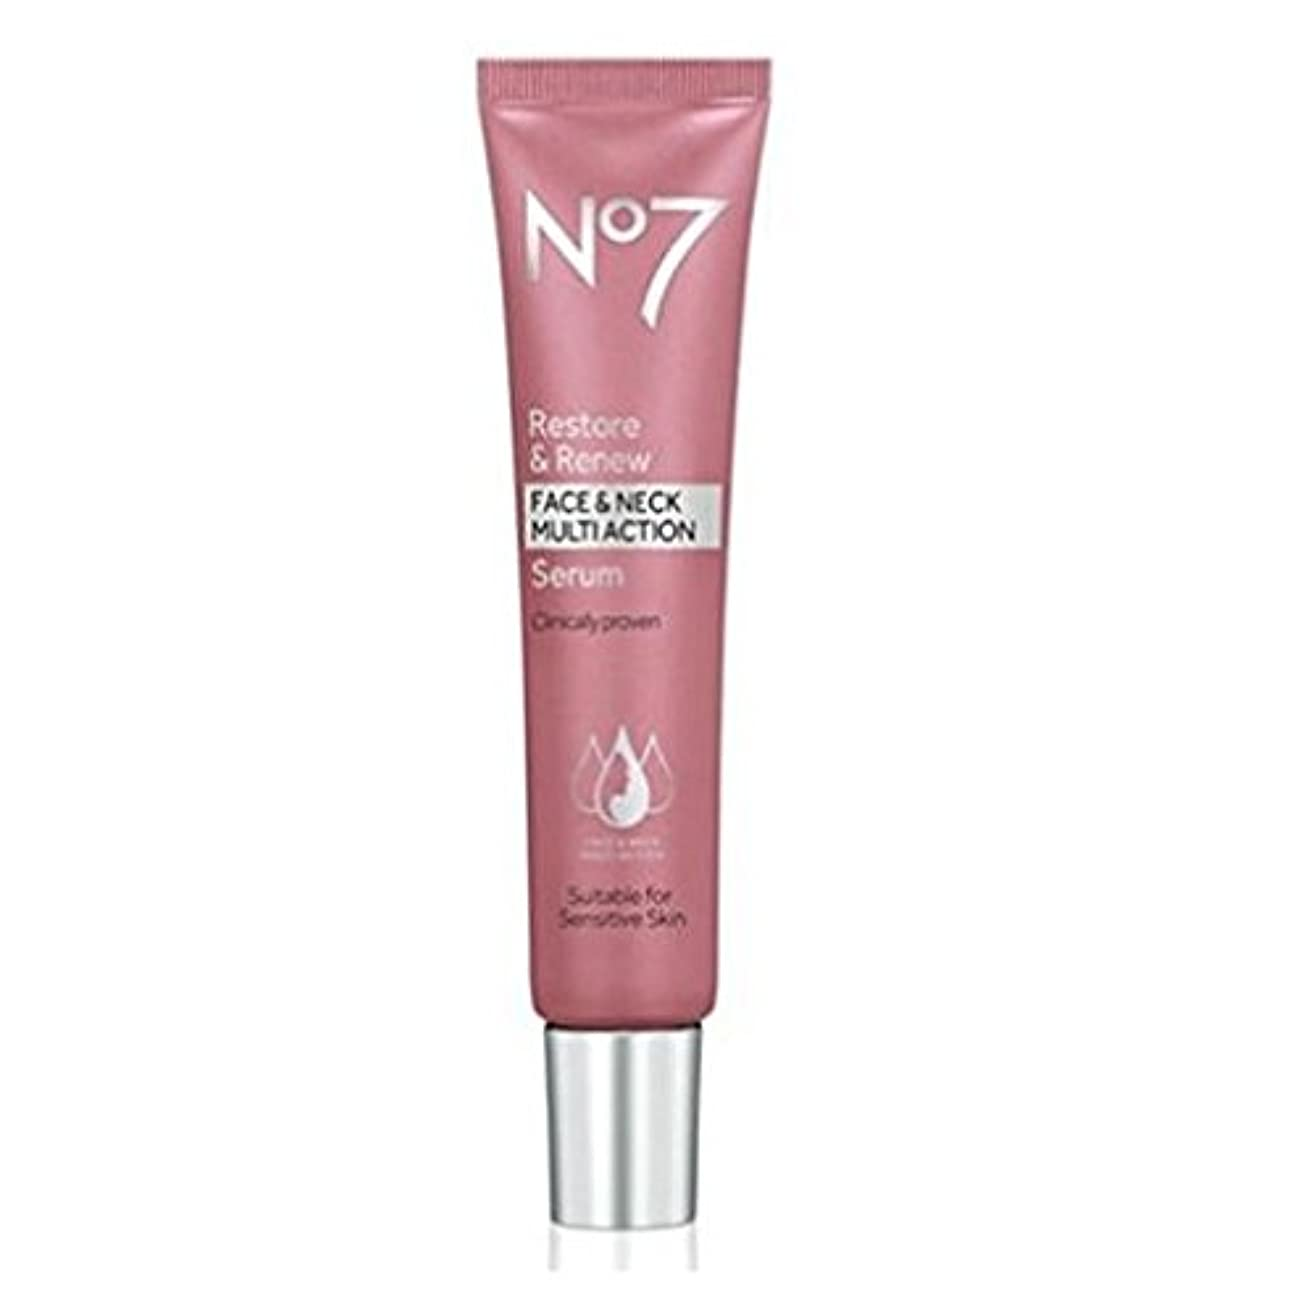 No7 Restore & Renew Face And Neck Multi Action Serum 50 Milliliter